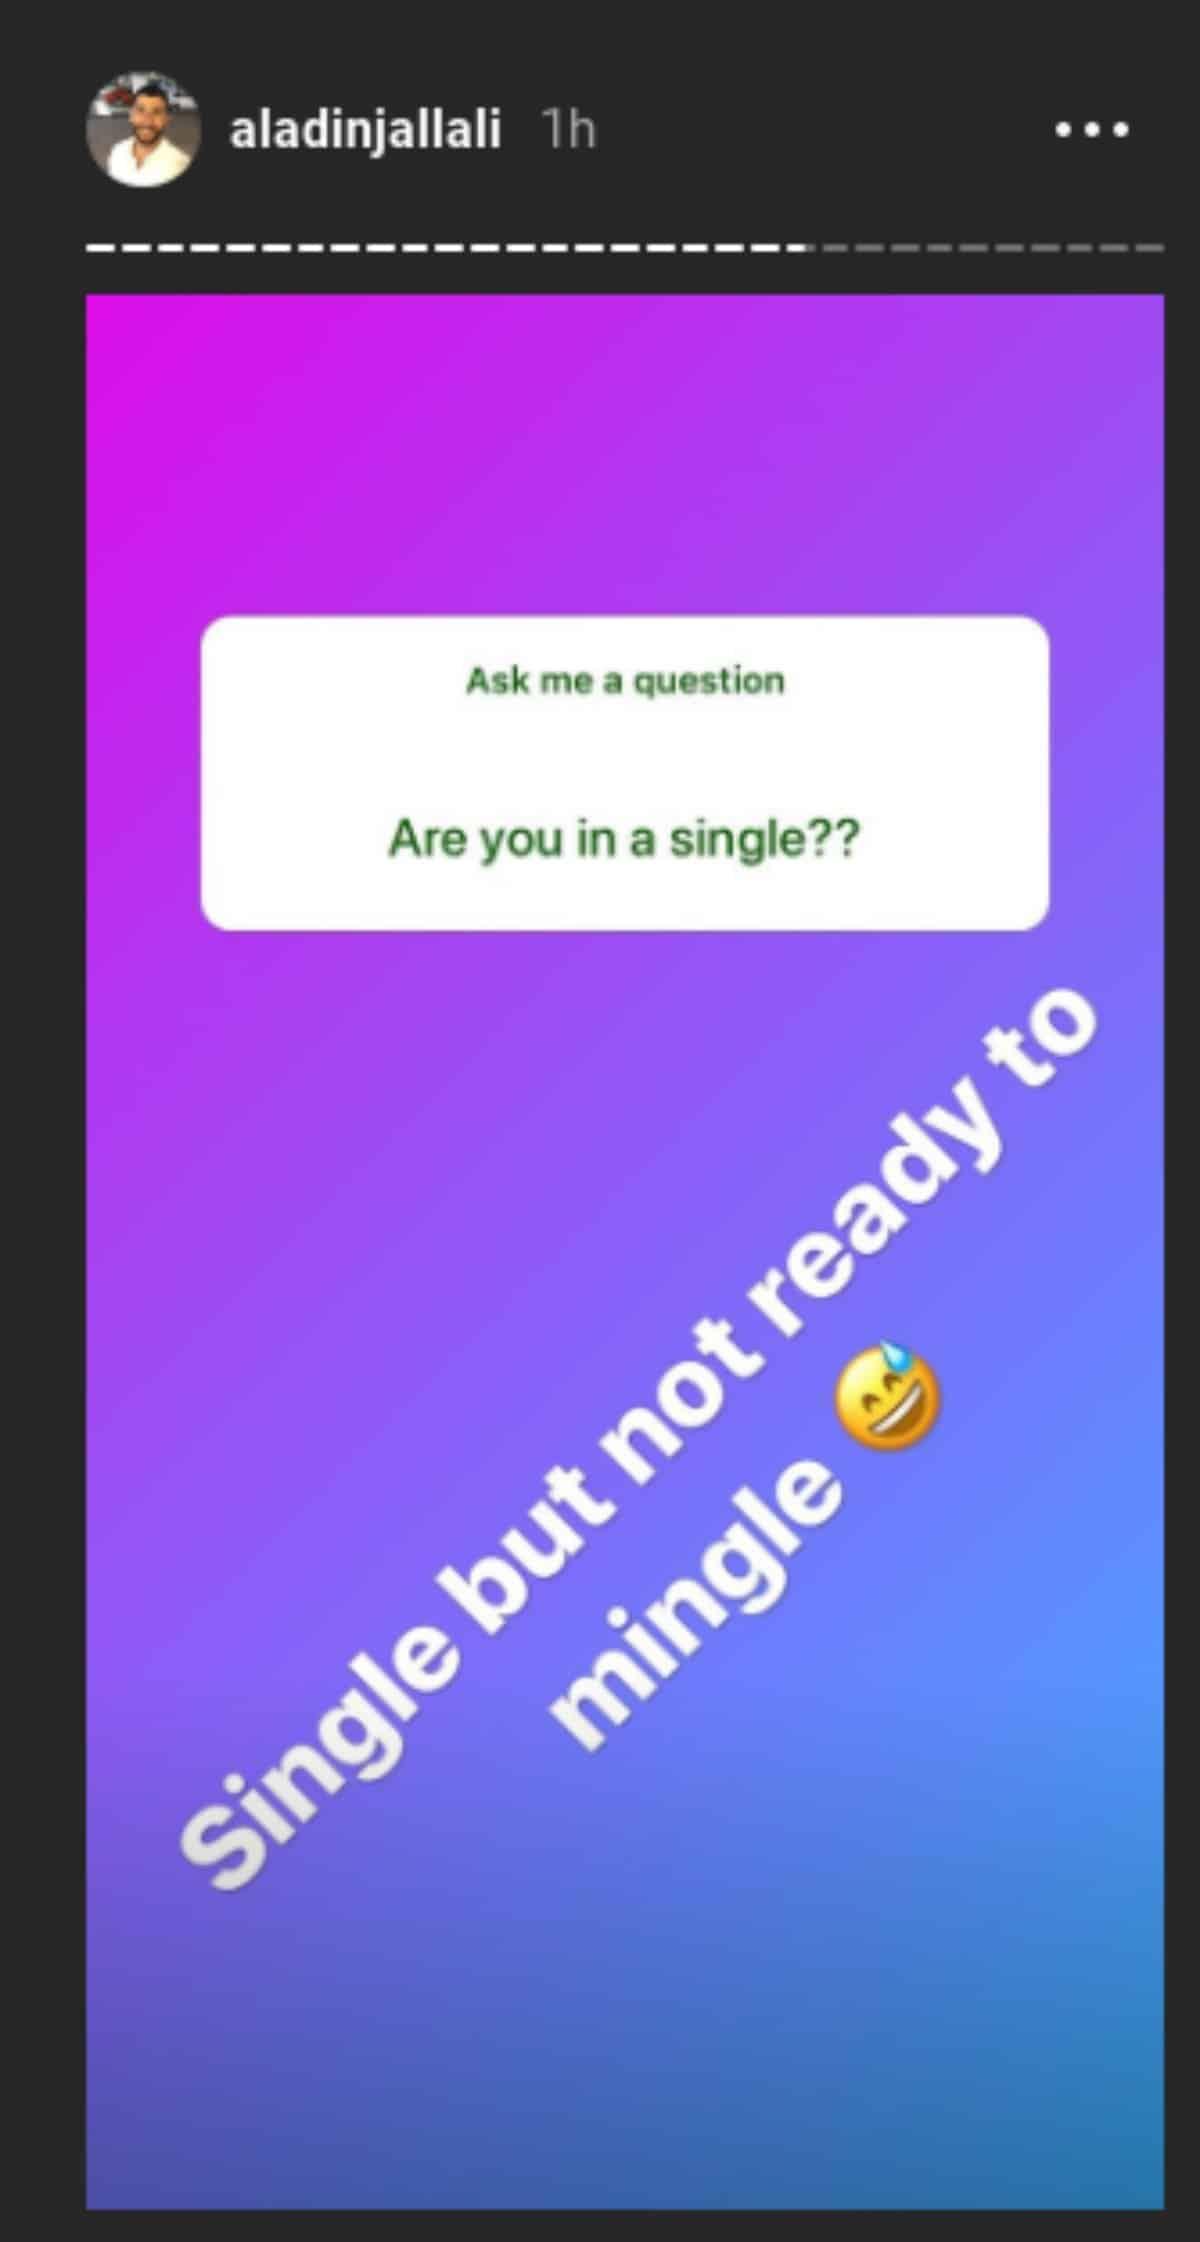 Aladin Jallali on Instagram